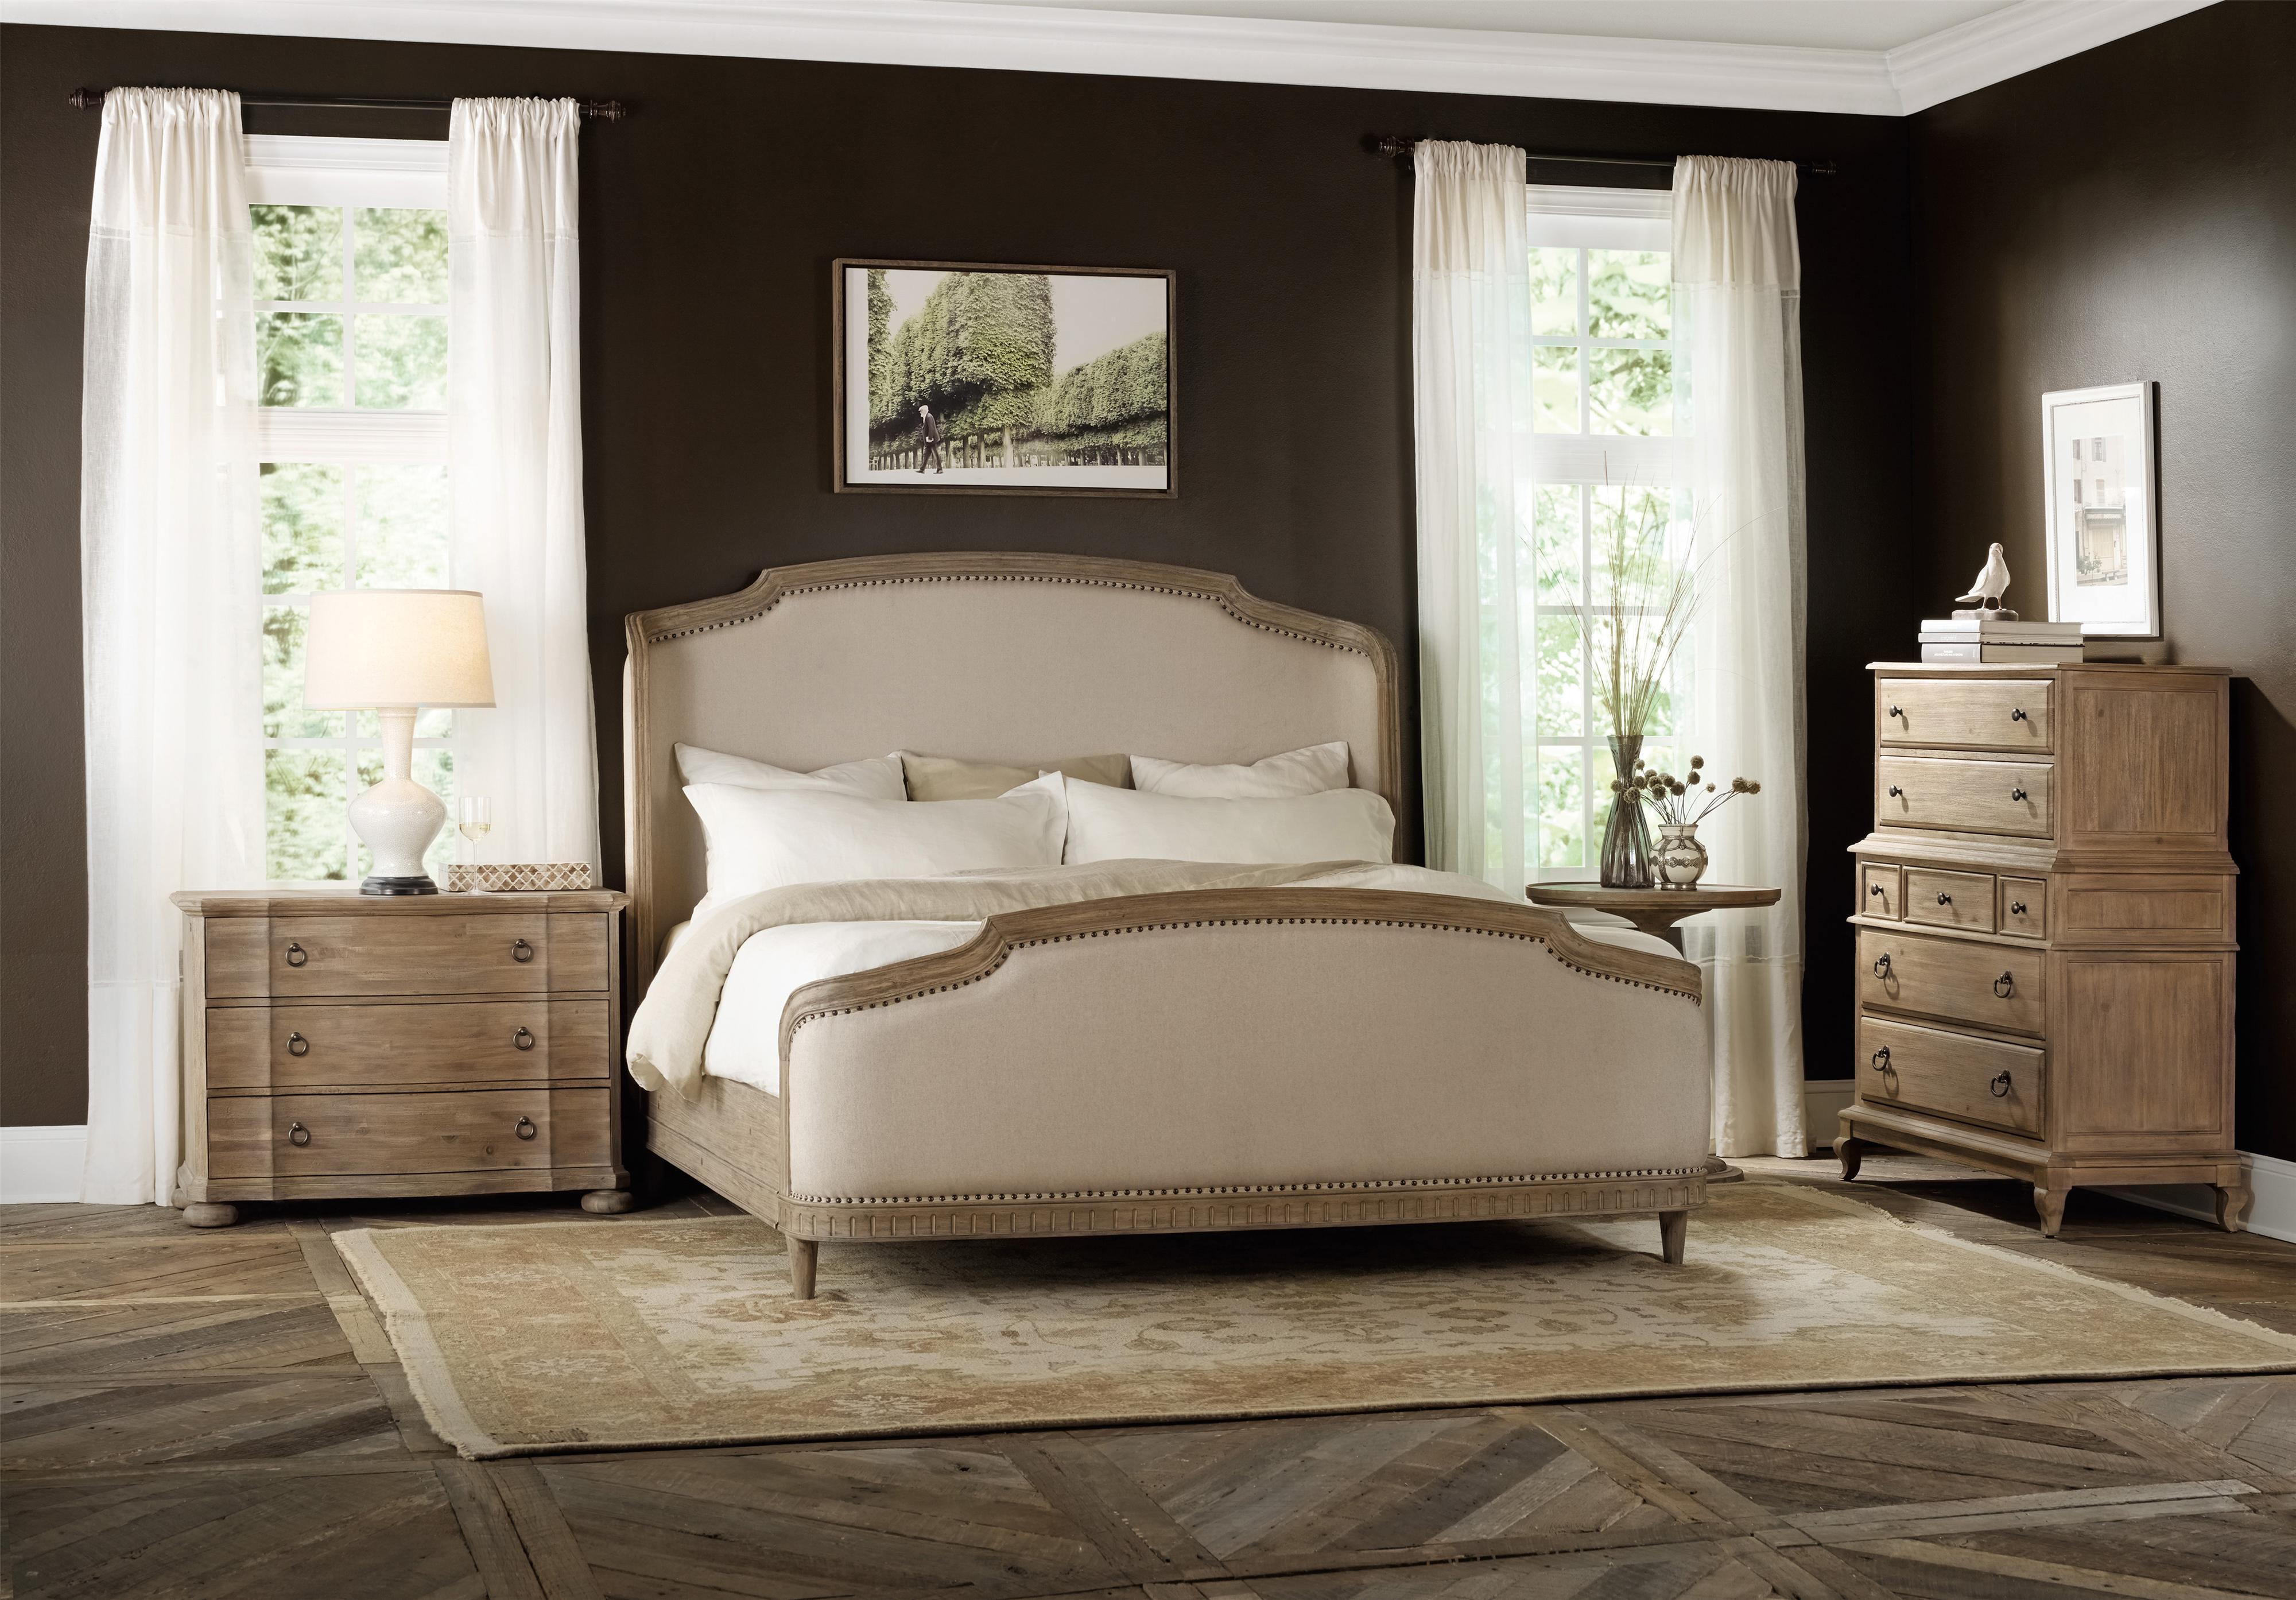 Corsica Queen Shelter Bedroom Group by Hooker Furniture at Baer's Furniture